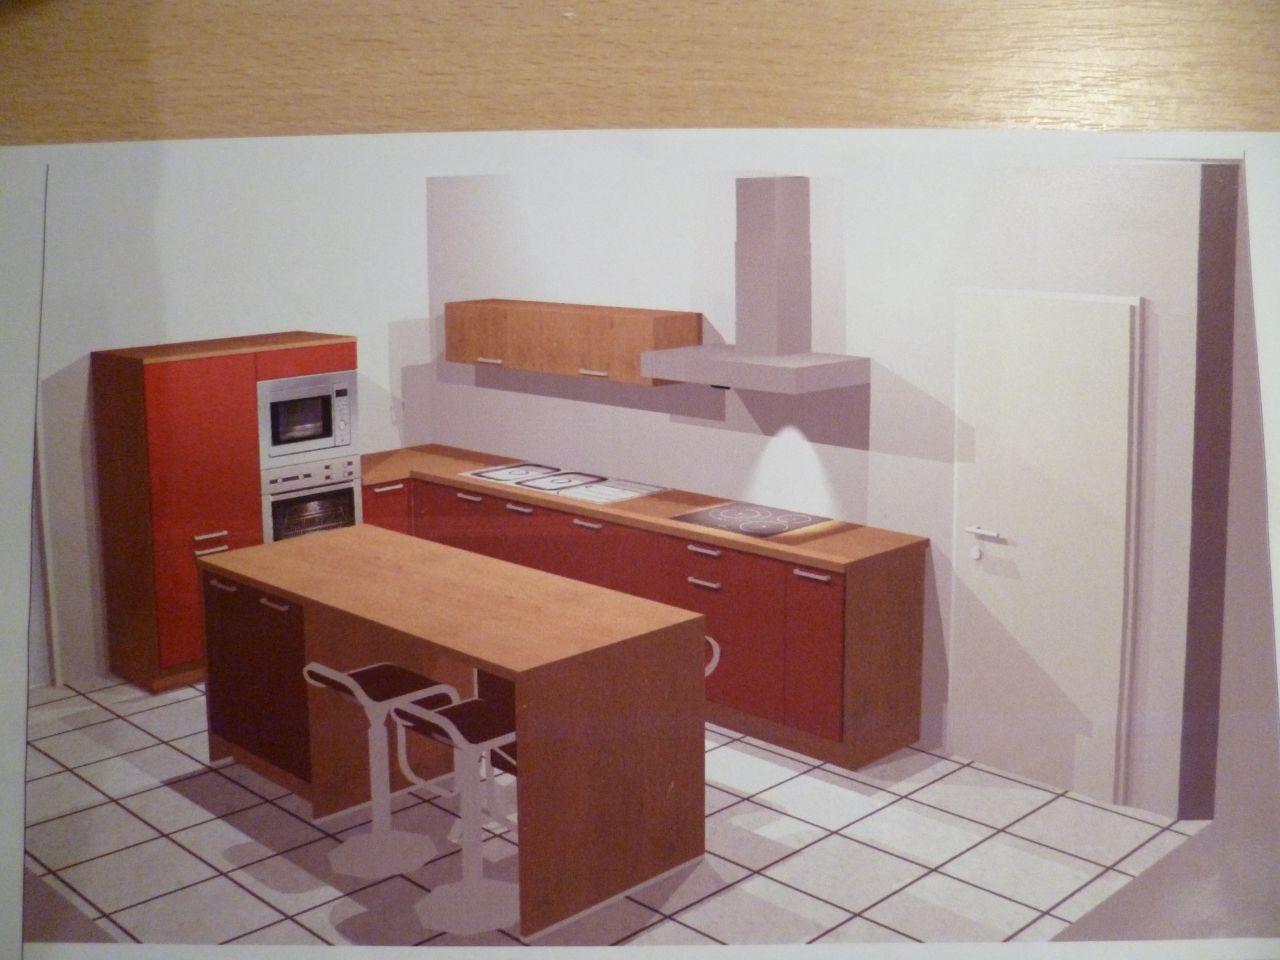 ixina carcassonne agrandir la carte luadresse columbo immobilier carcassonne free grue jouet. Black Bedroom Furniture Sets. Home Design Ideas